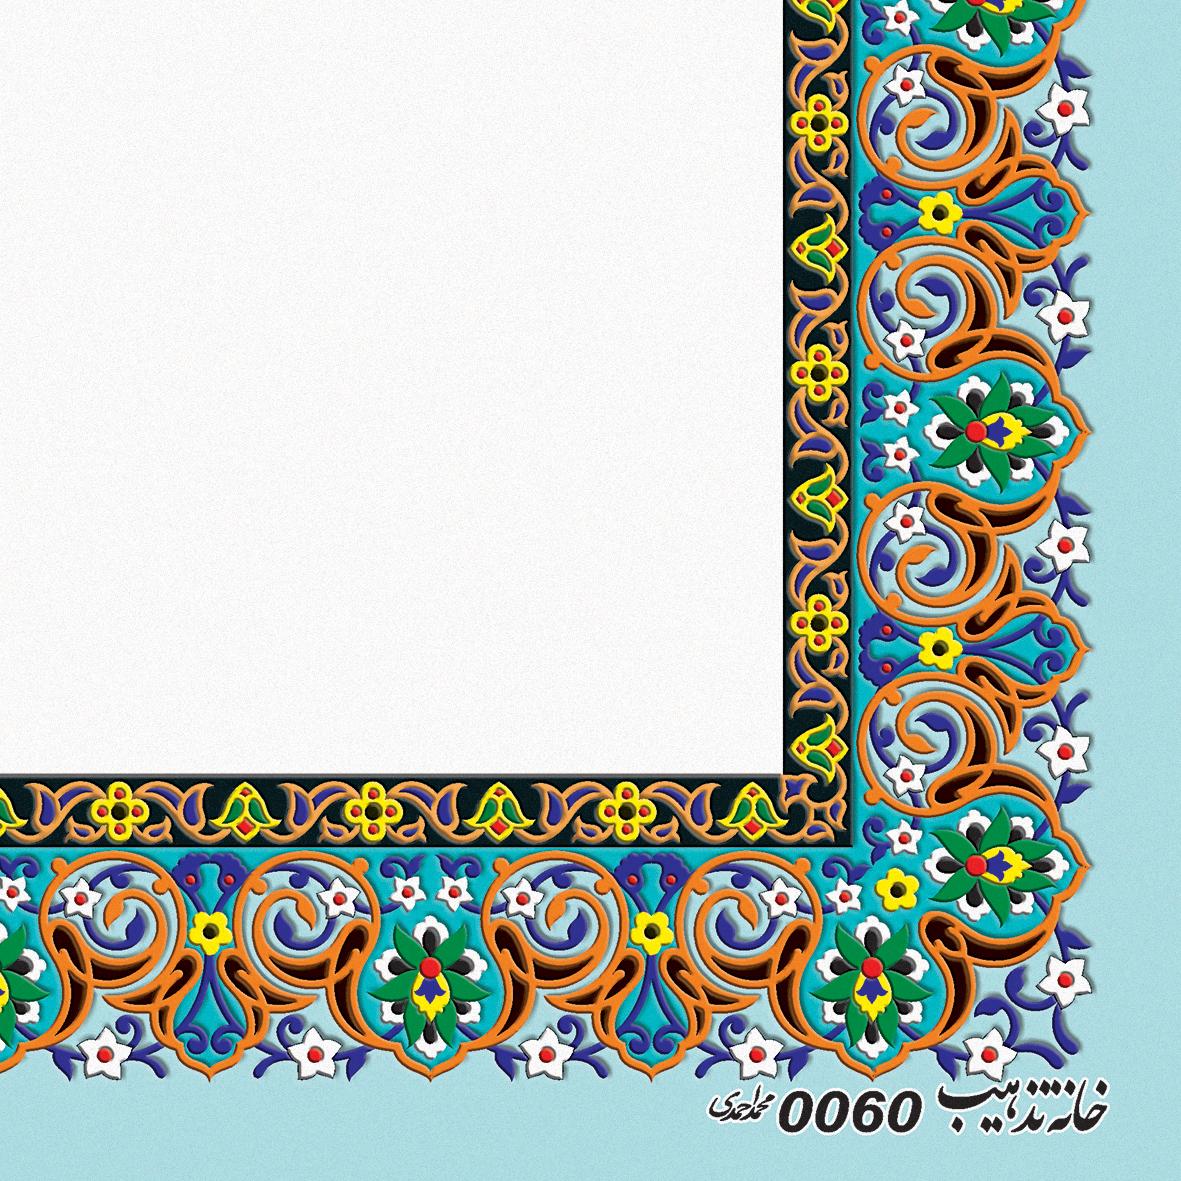 کاغذ تذهیب A4 خانه تذهیب طرح کاشی کاری کد 0060 بسته 10عددی